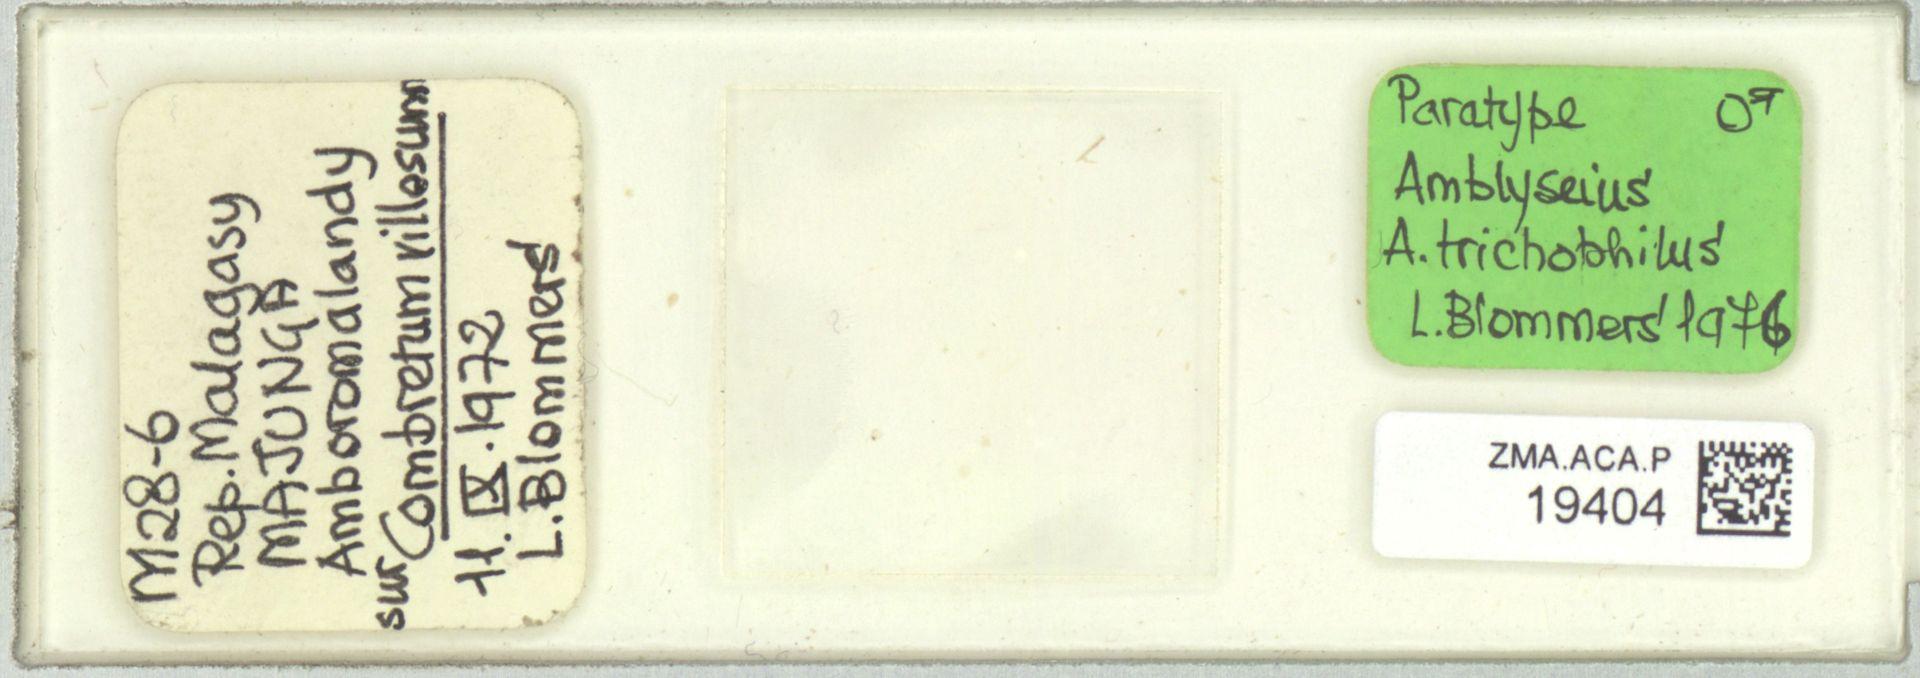 ZMA.ACA.P.19404 | Amblyseius (Amblyseius) trichophilus Blommers, 1976